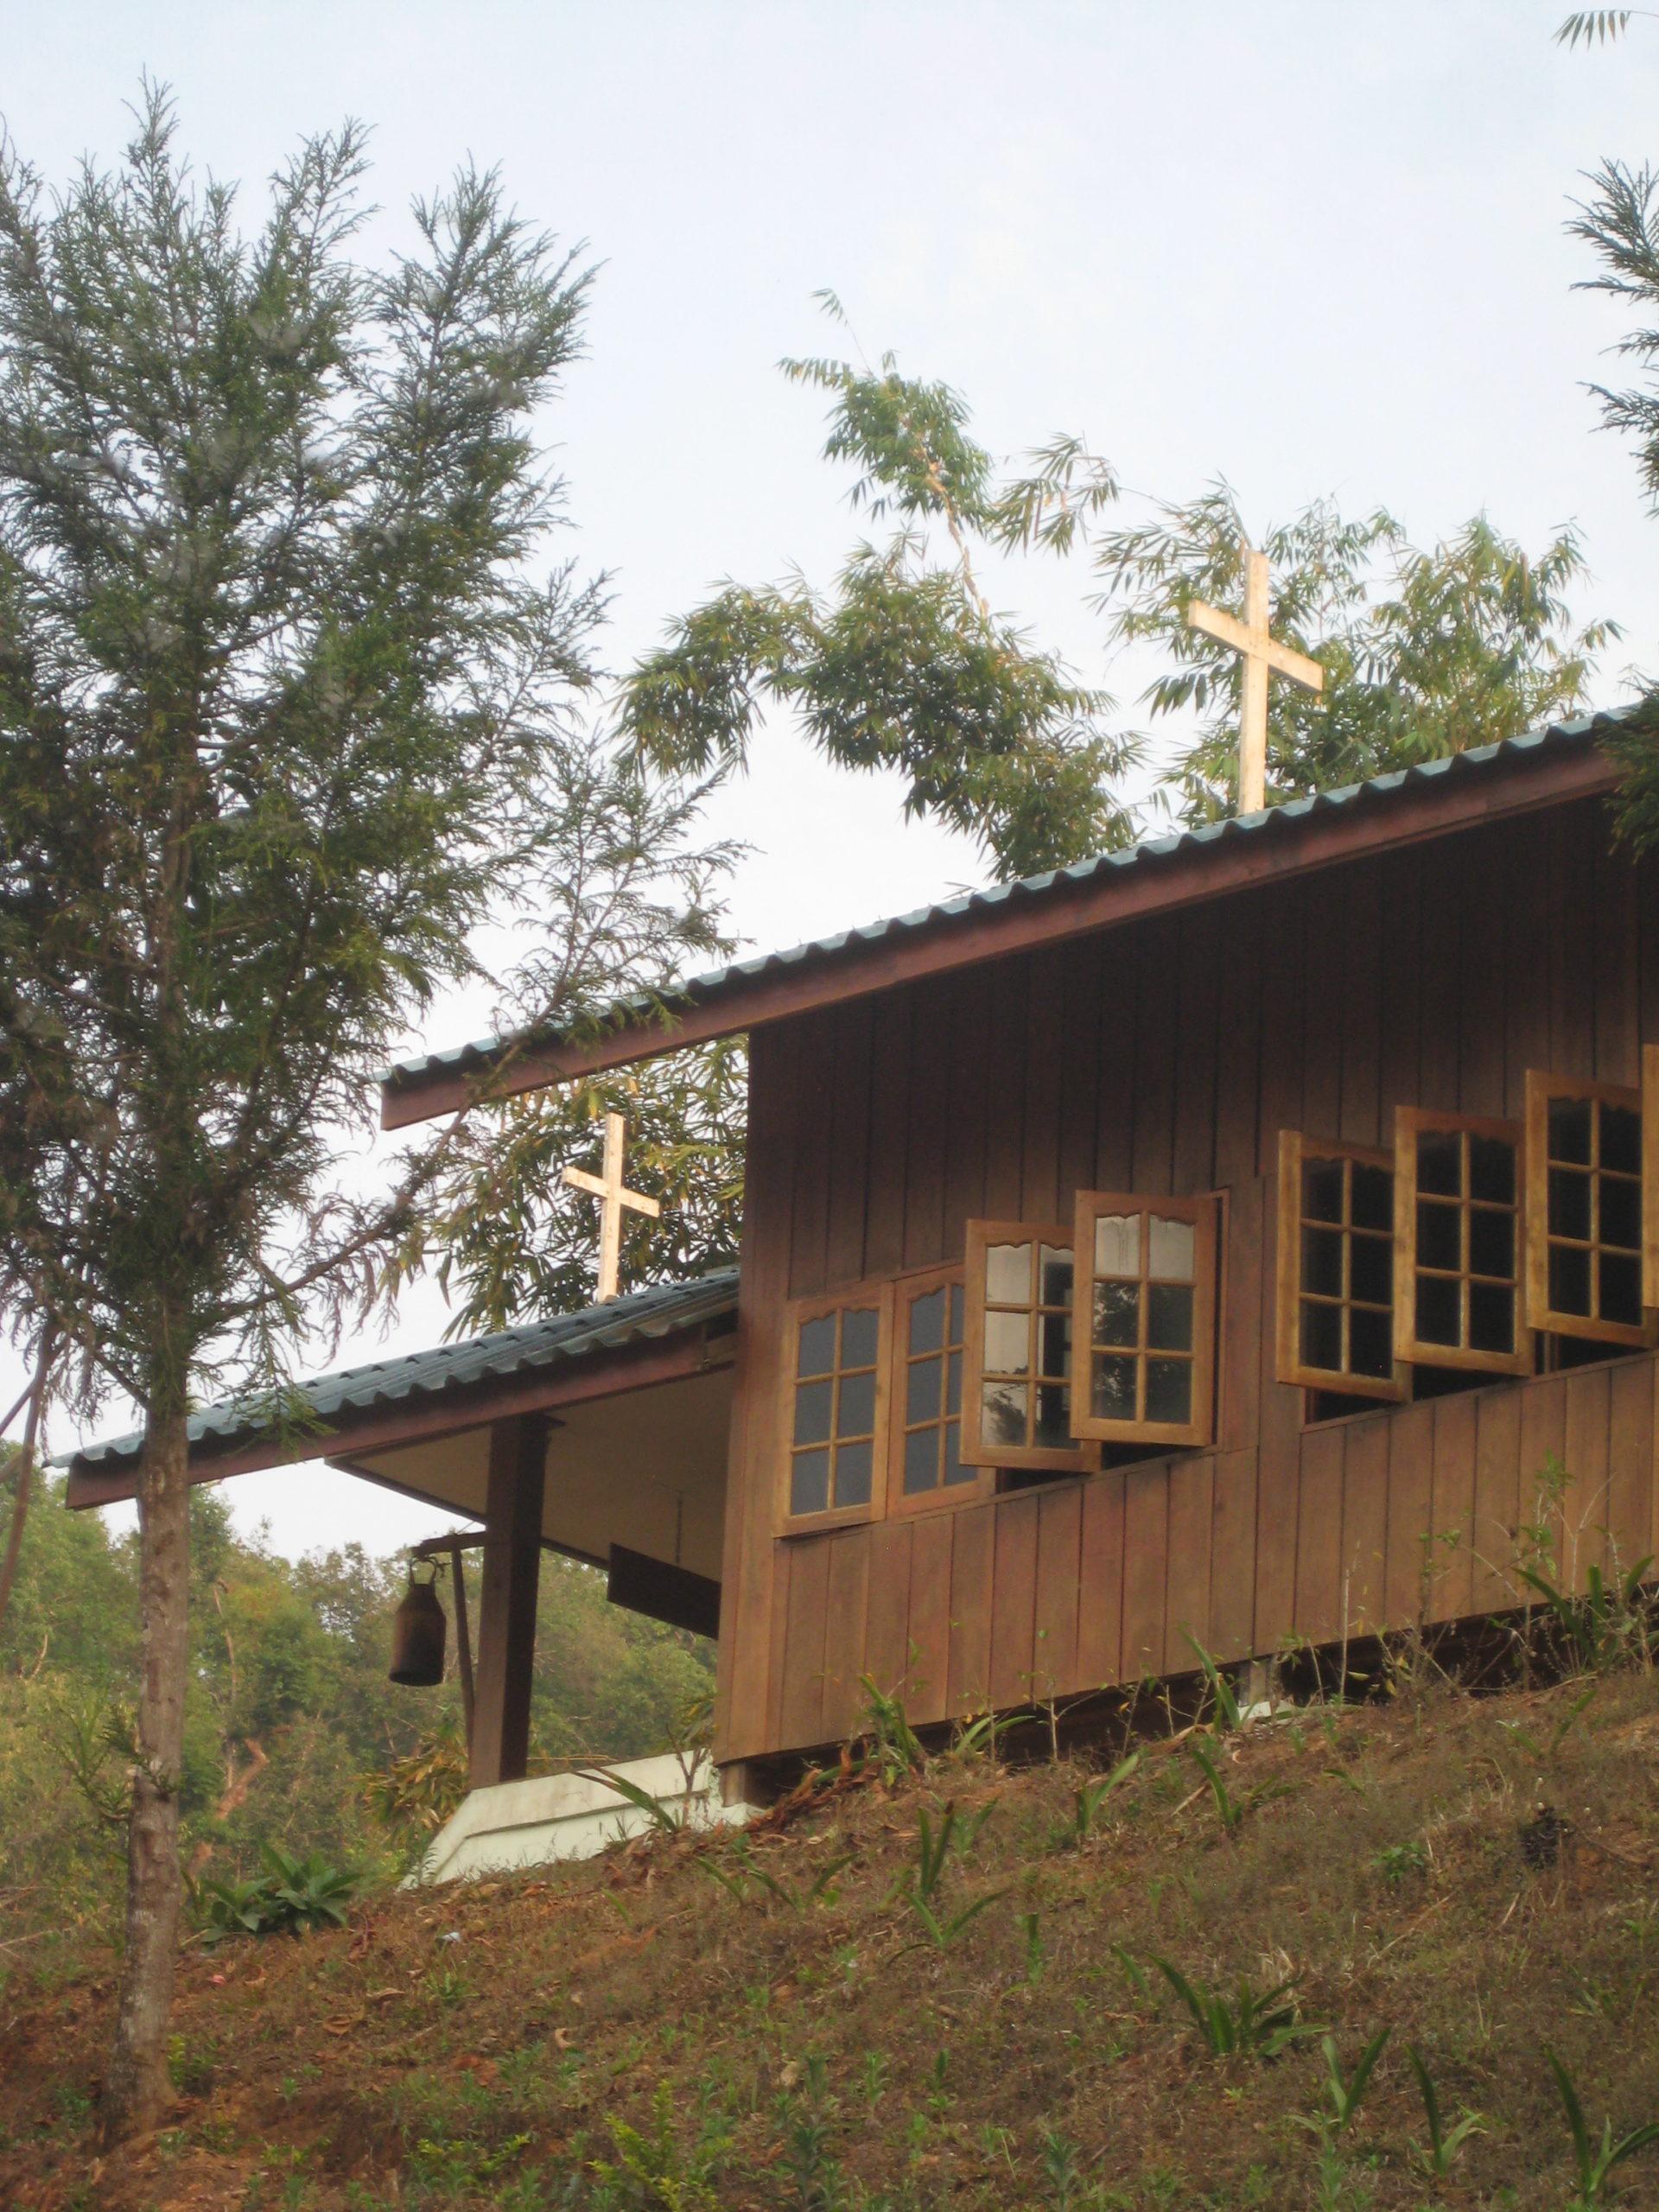 L'église de Maesapao aujourd'hui